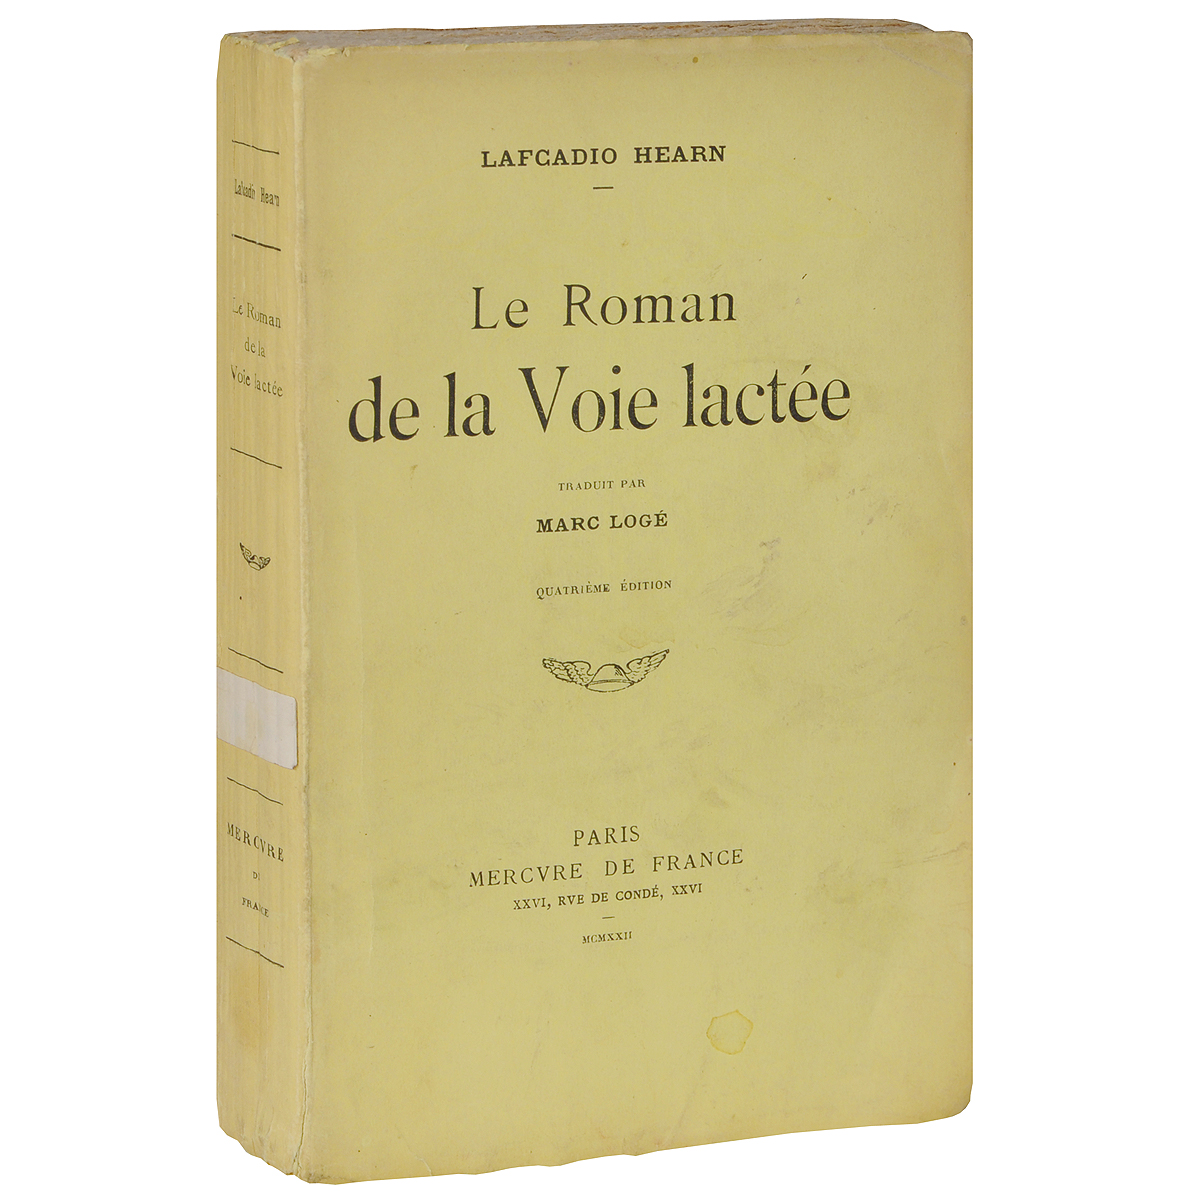 Le Roman de la Voie lactee тушь для ресниц essence instant volume boost mascara smudge proof and intense black цвет 01 black variant hex name 000000